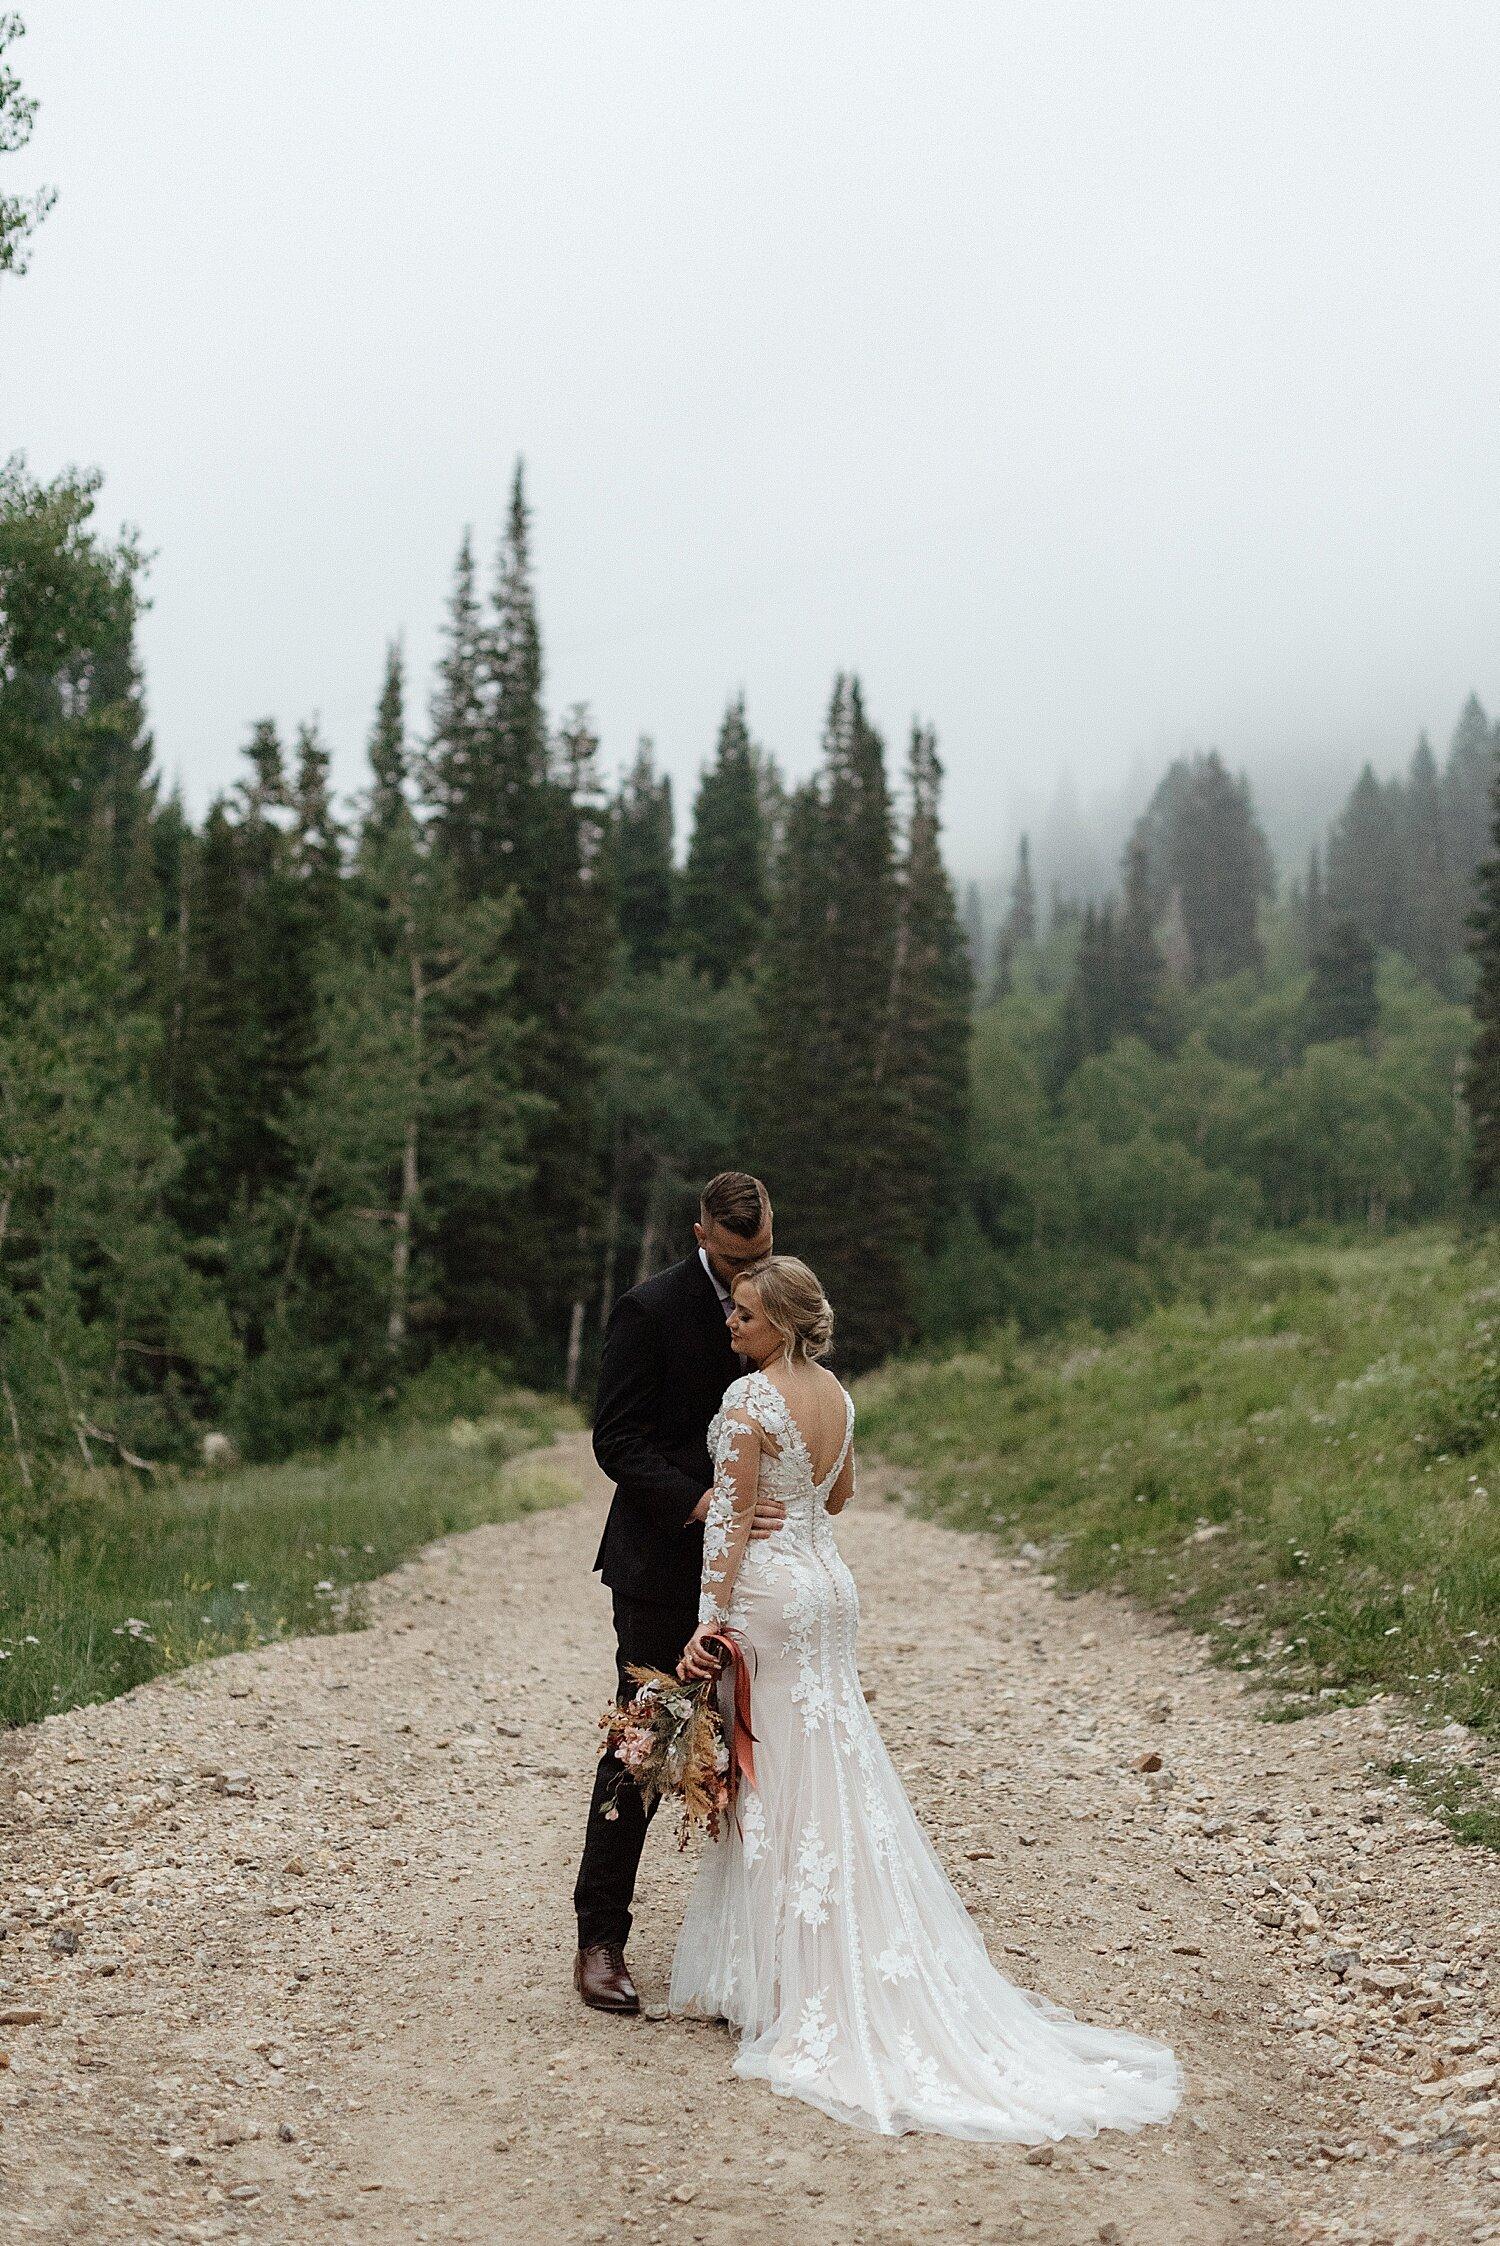 Zandra Barriga Photo - Hunter and Brighton Mountain Bridals_0021.jpg